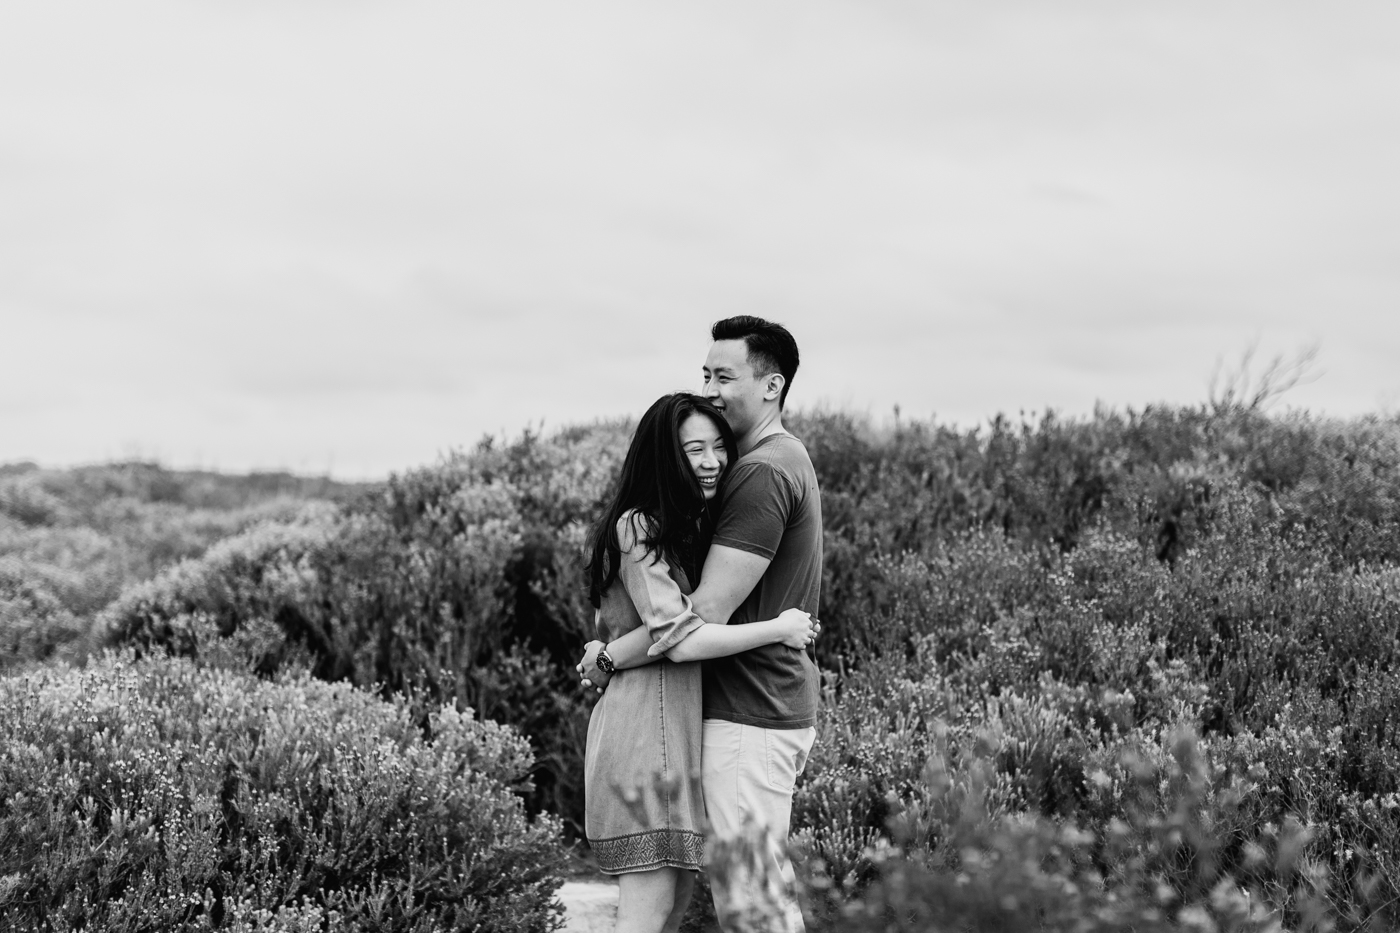 Lishien & Jason Engagement - Kurnell Cliffs - Samantha Heather Photography-4.jpg